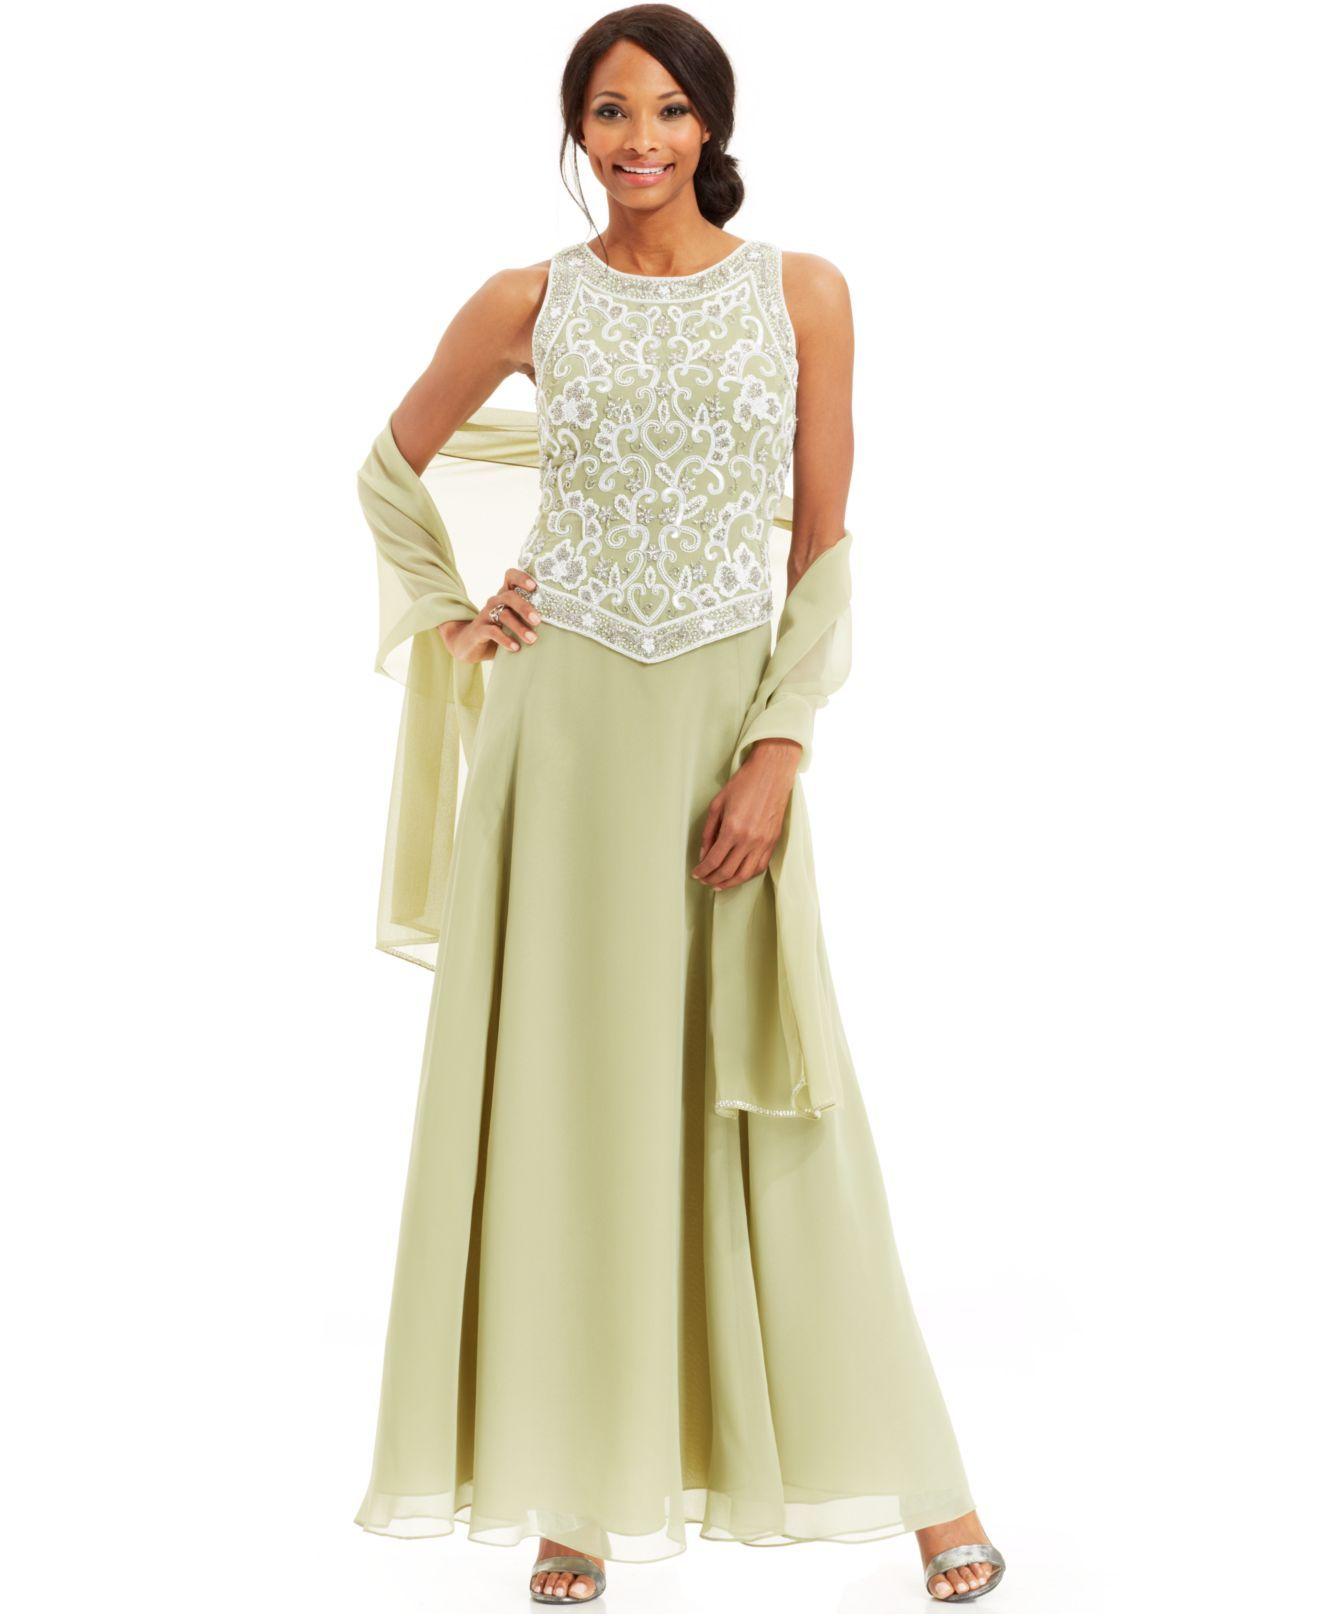 J Kara Dresses Green _Other dresses_dressesss